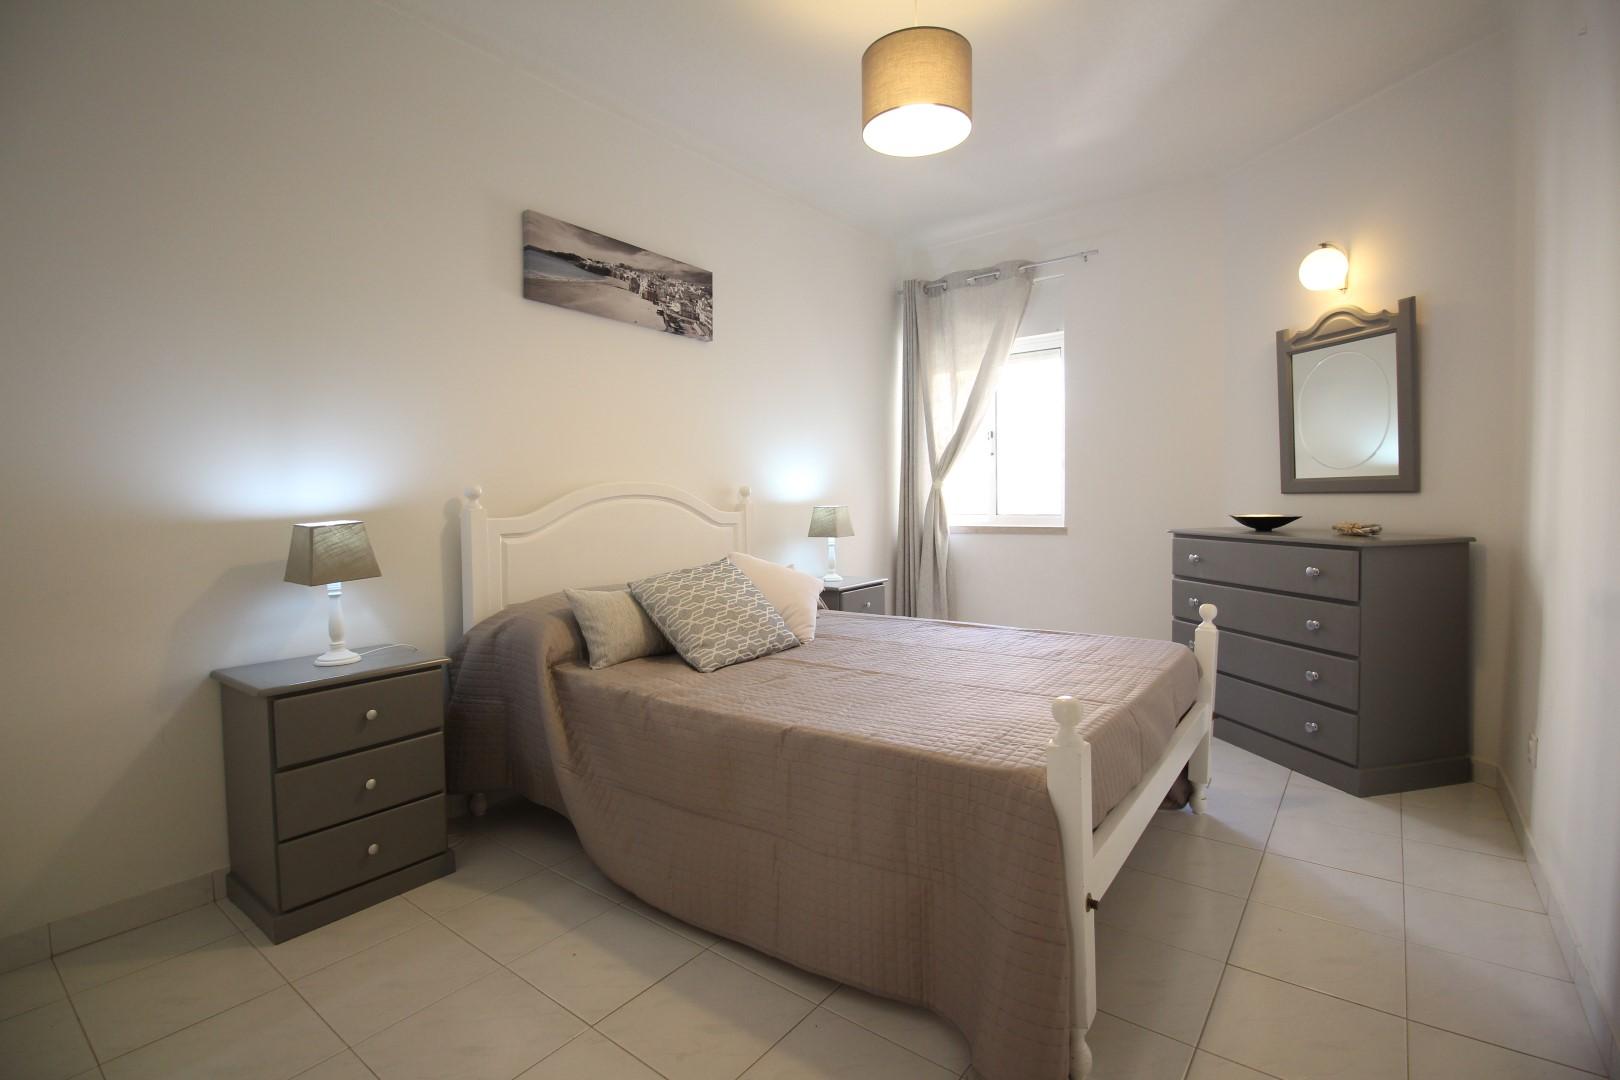 Location appartements et villas de vacance, Appartement en face de la plage – Armação-de-Pêra à Armação de Pêra, Portugal Algarve, REF_IMG_6809_8735